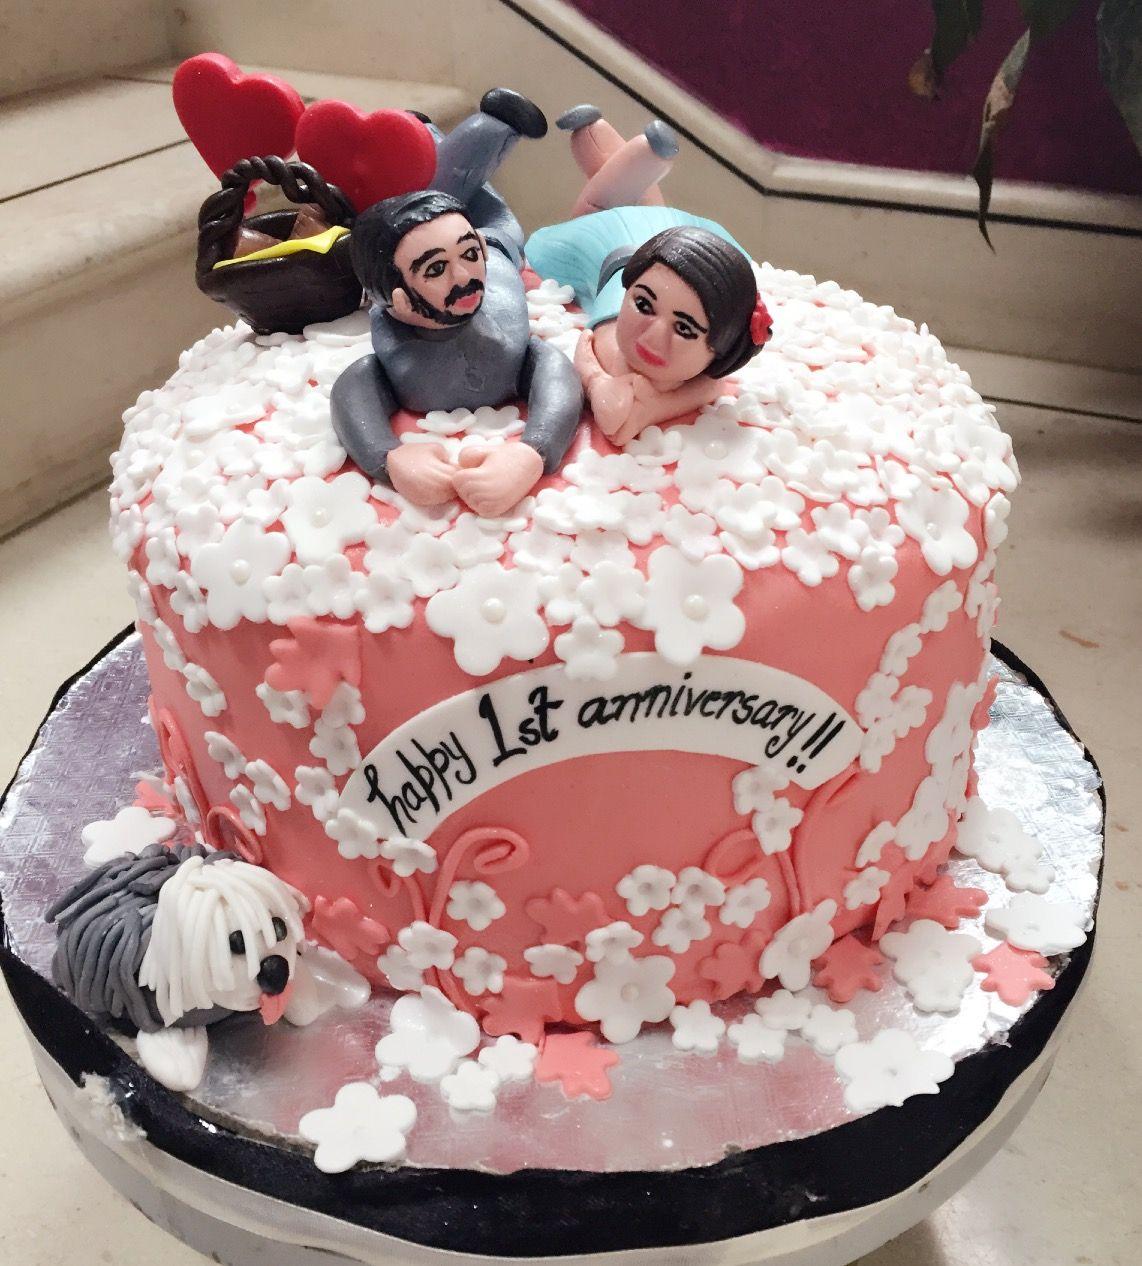 Cute Anniversary Cake With Fondant Couple Cake Anniversary Cake Valentines Day Cakes